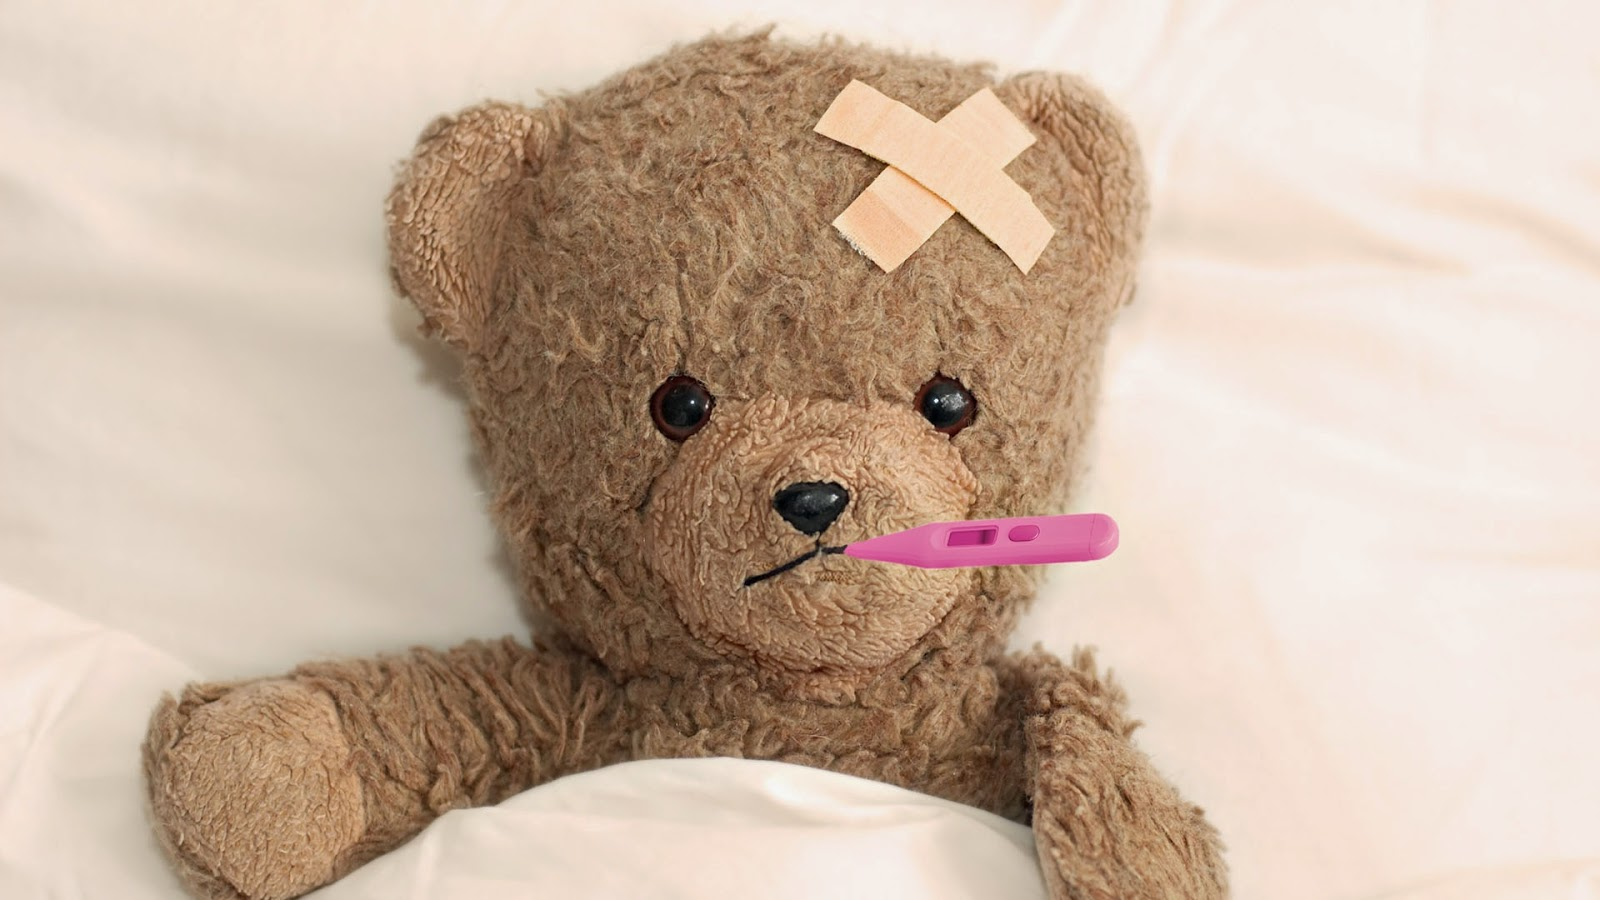 Teddy-get-well-soon-image-1920x1080.jpg